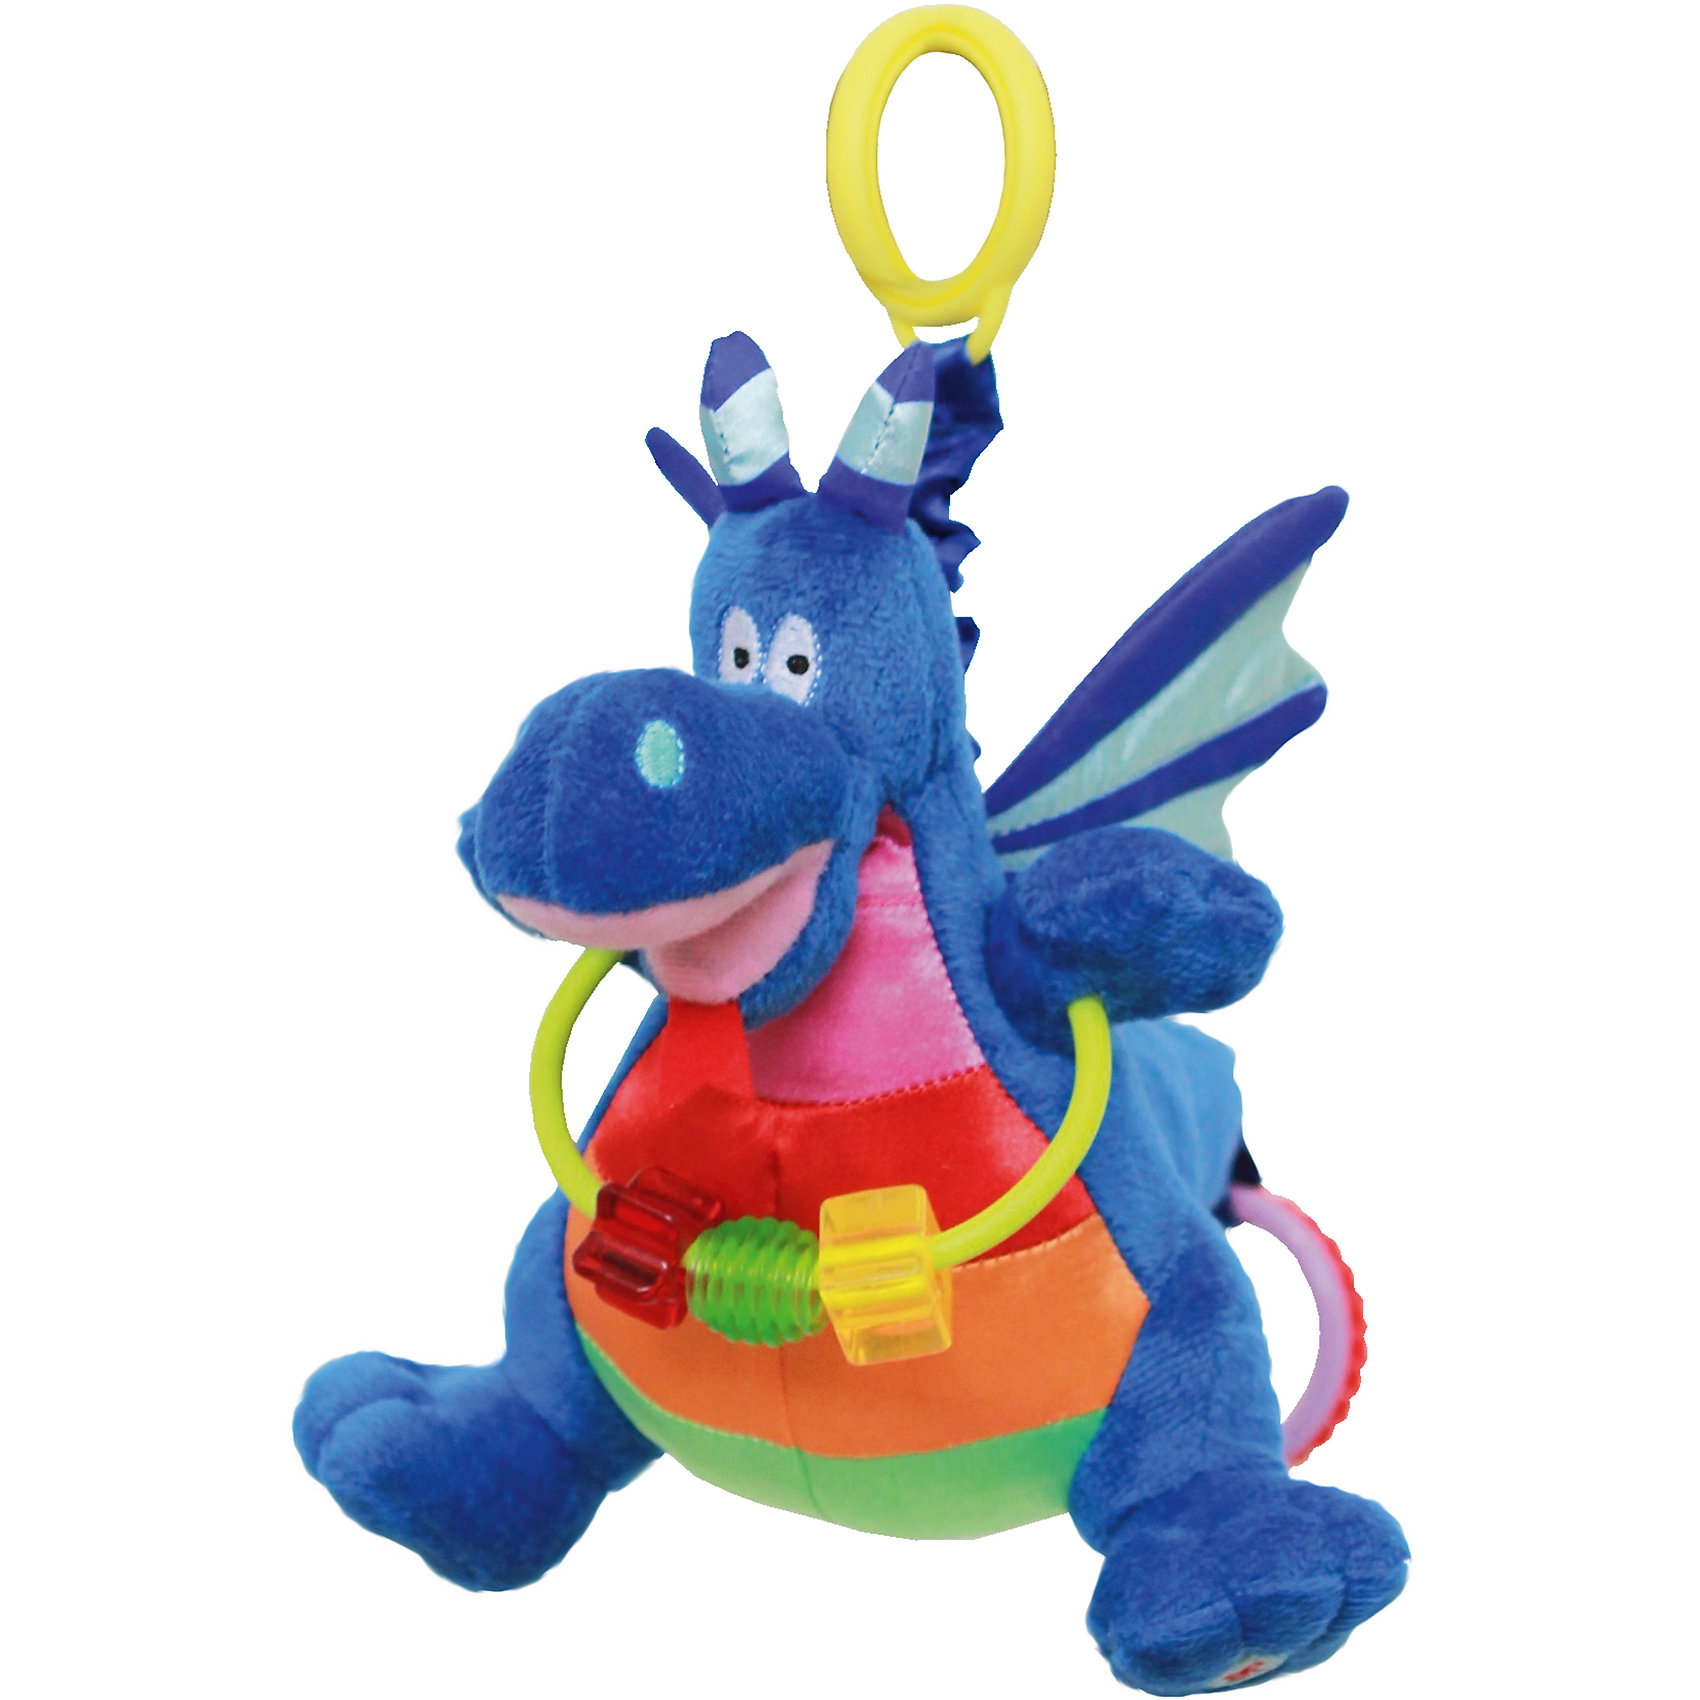 WeeWise Игрушка для коляски Дракон Джеки,  WeeWise погремушки weewise друзья крути верти 40110